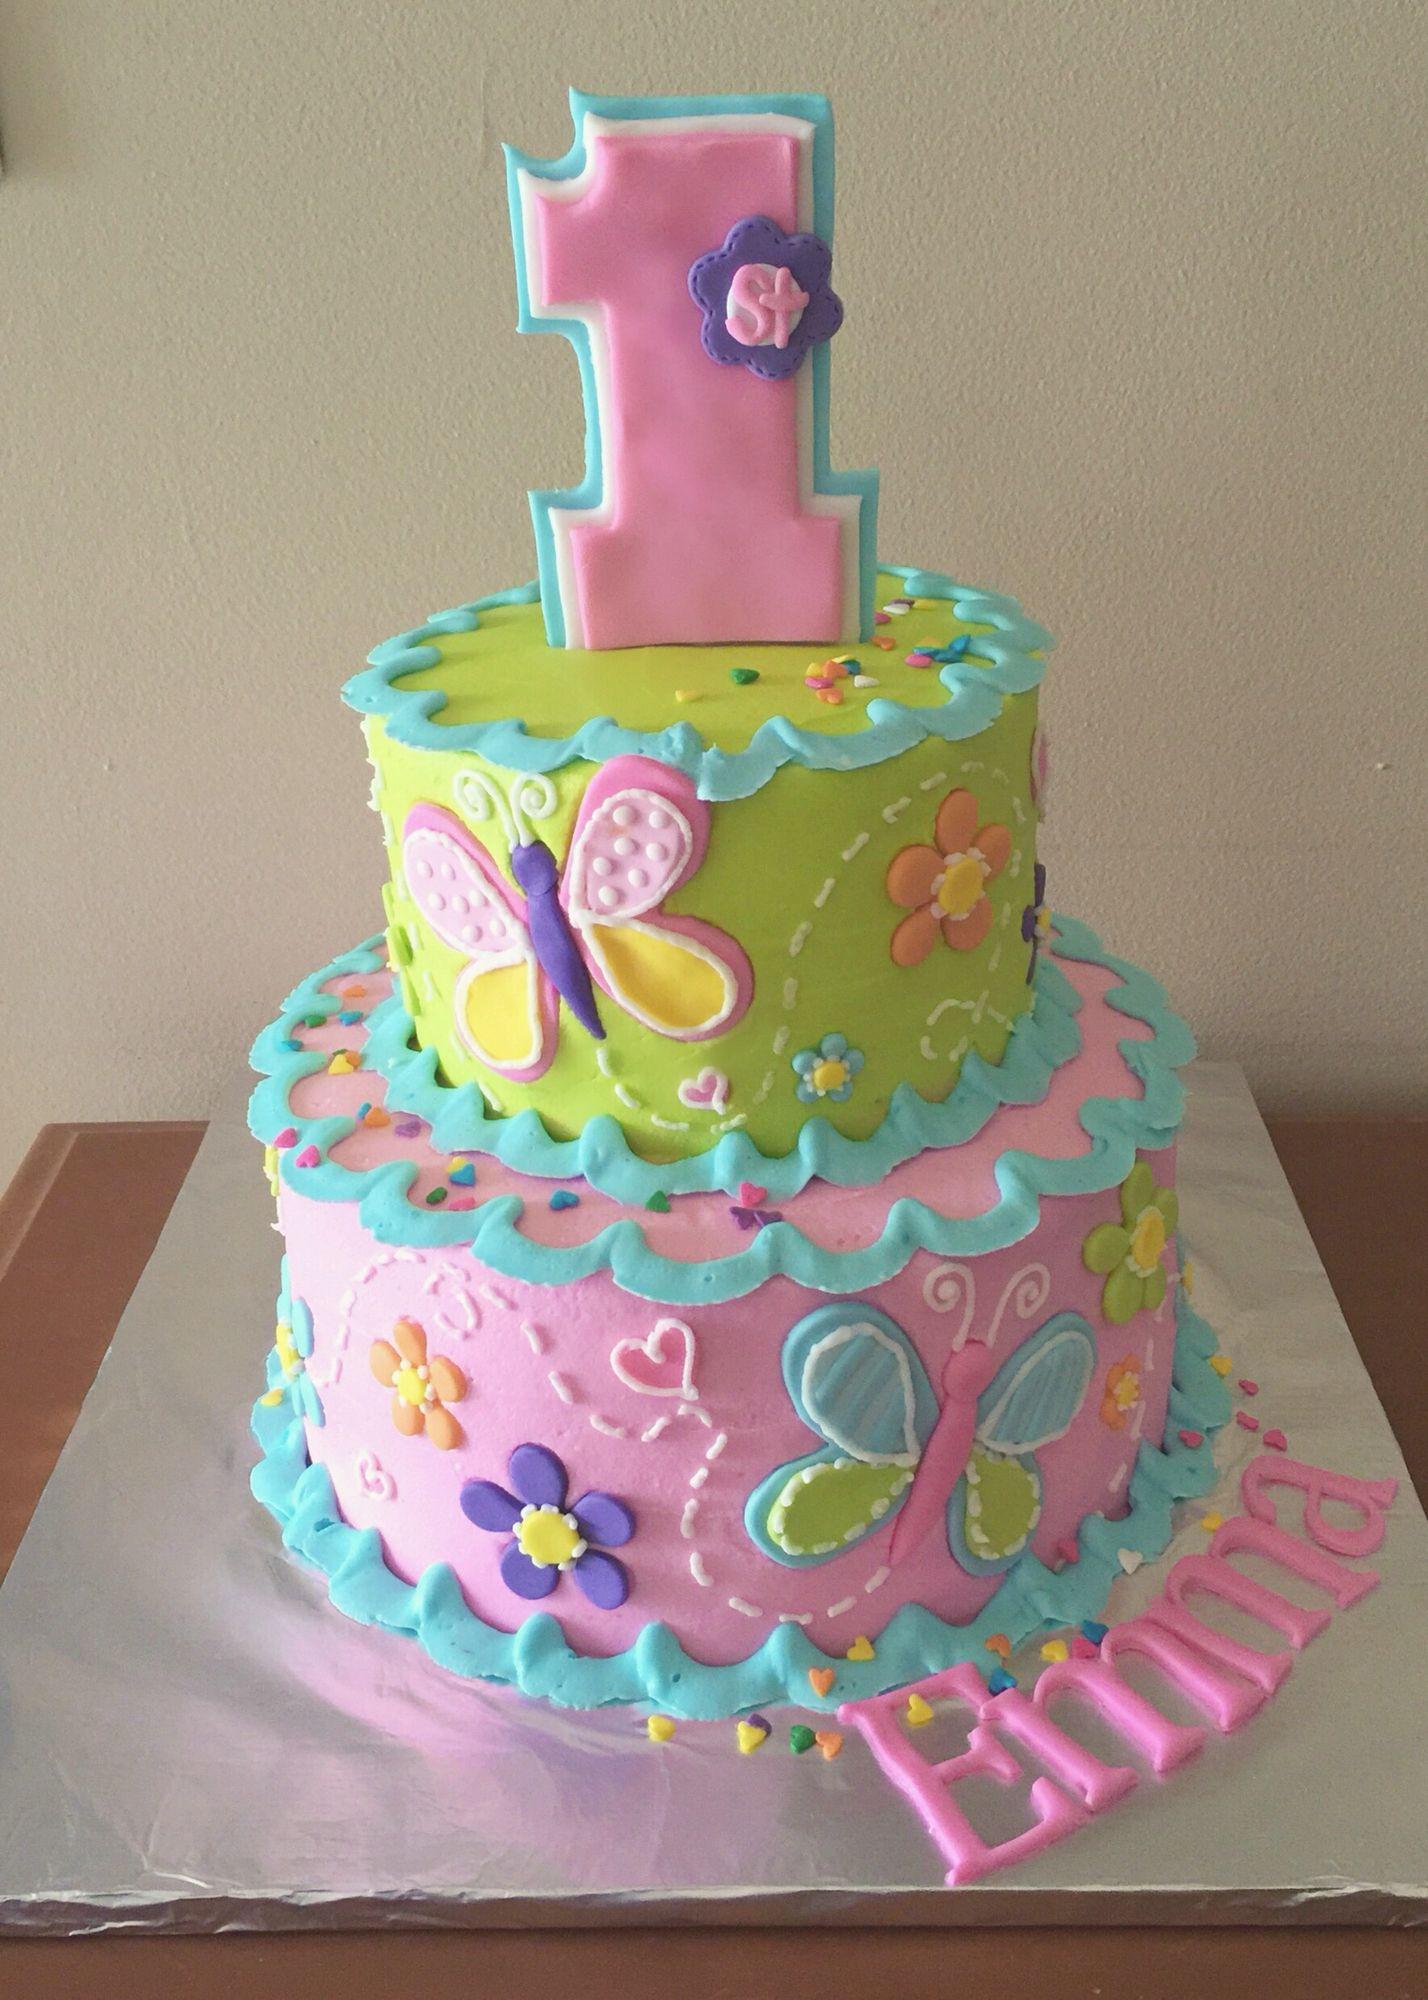 Stupendous 27 Brilliant Picture Of 1St Birthday Girl Cakes Birijus Com Funny Birthday Cards Online Barepcheapnameinfo